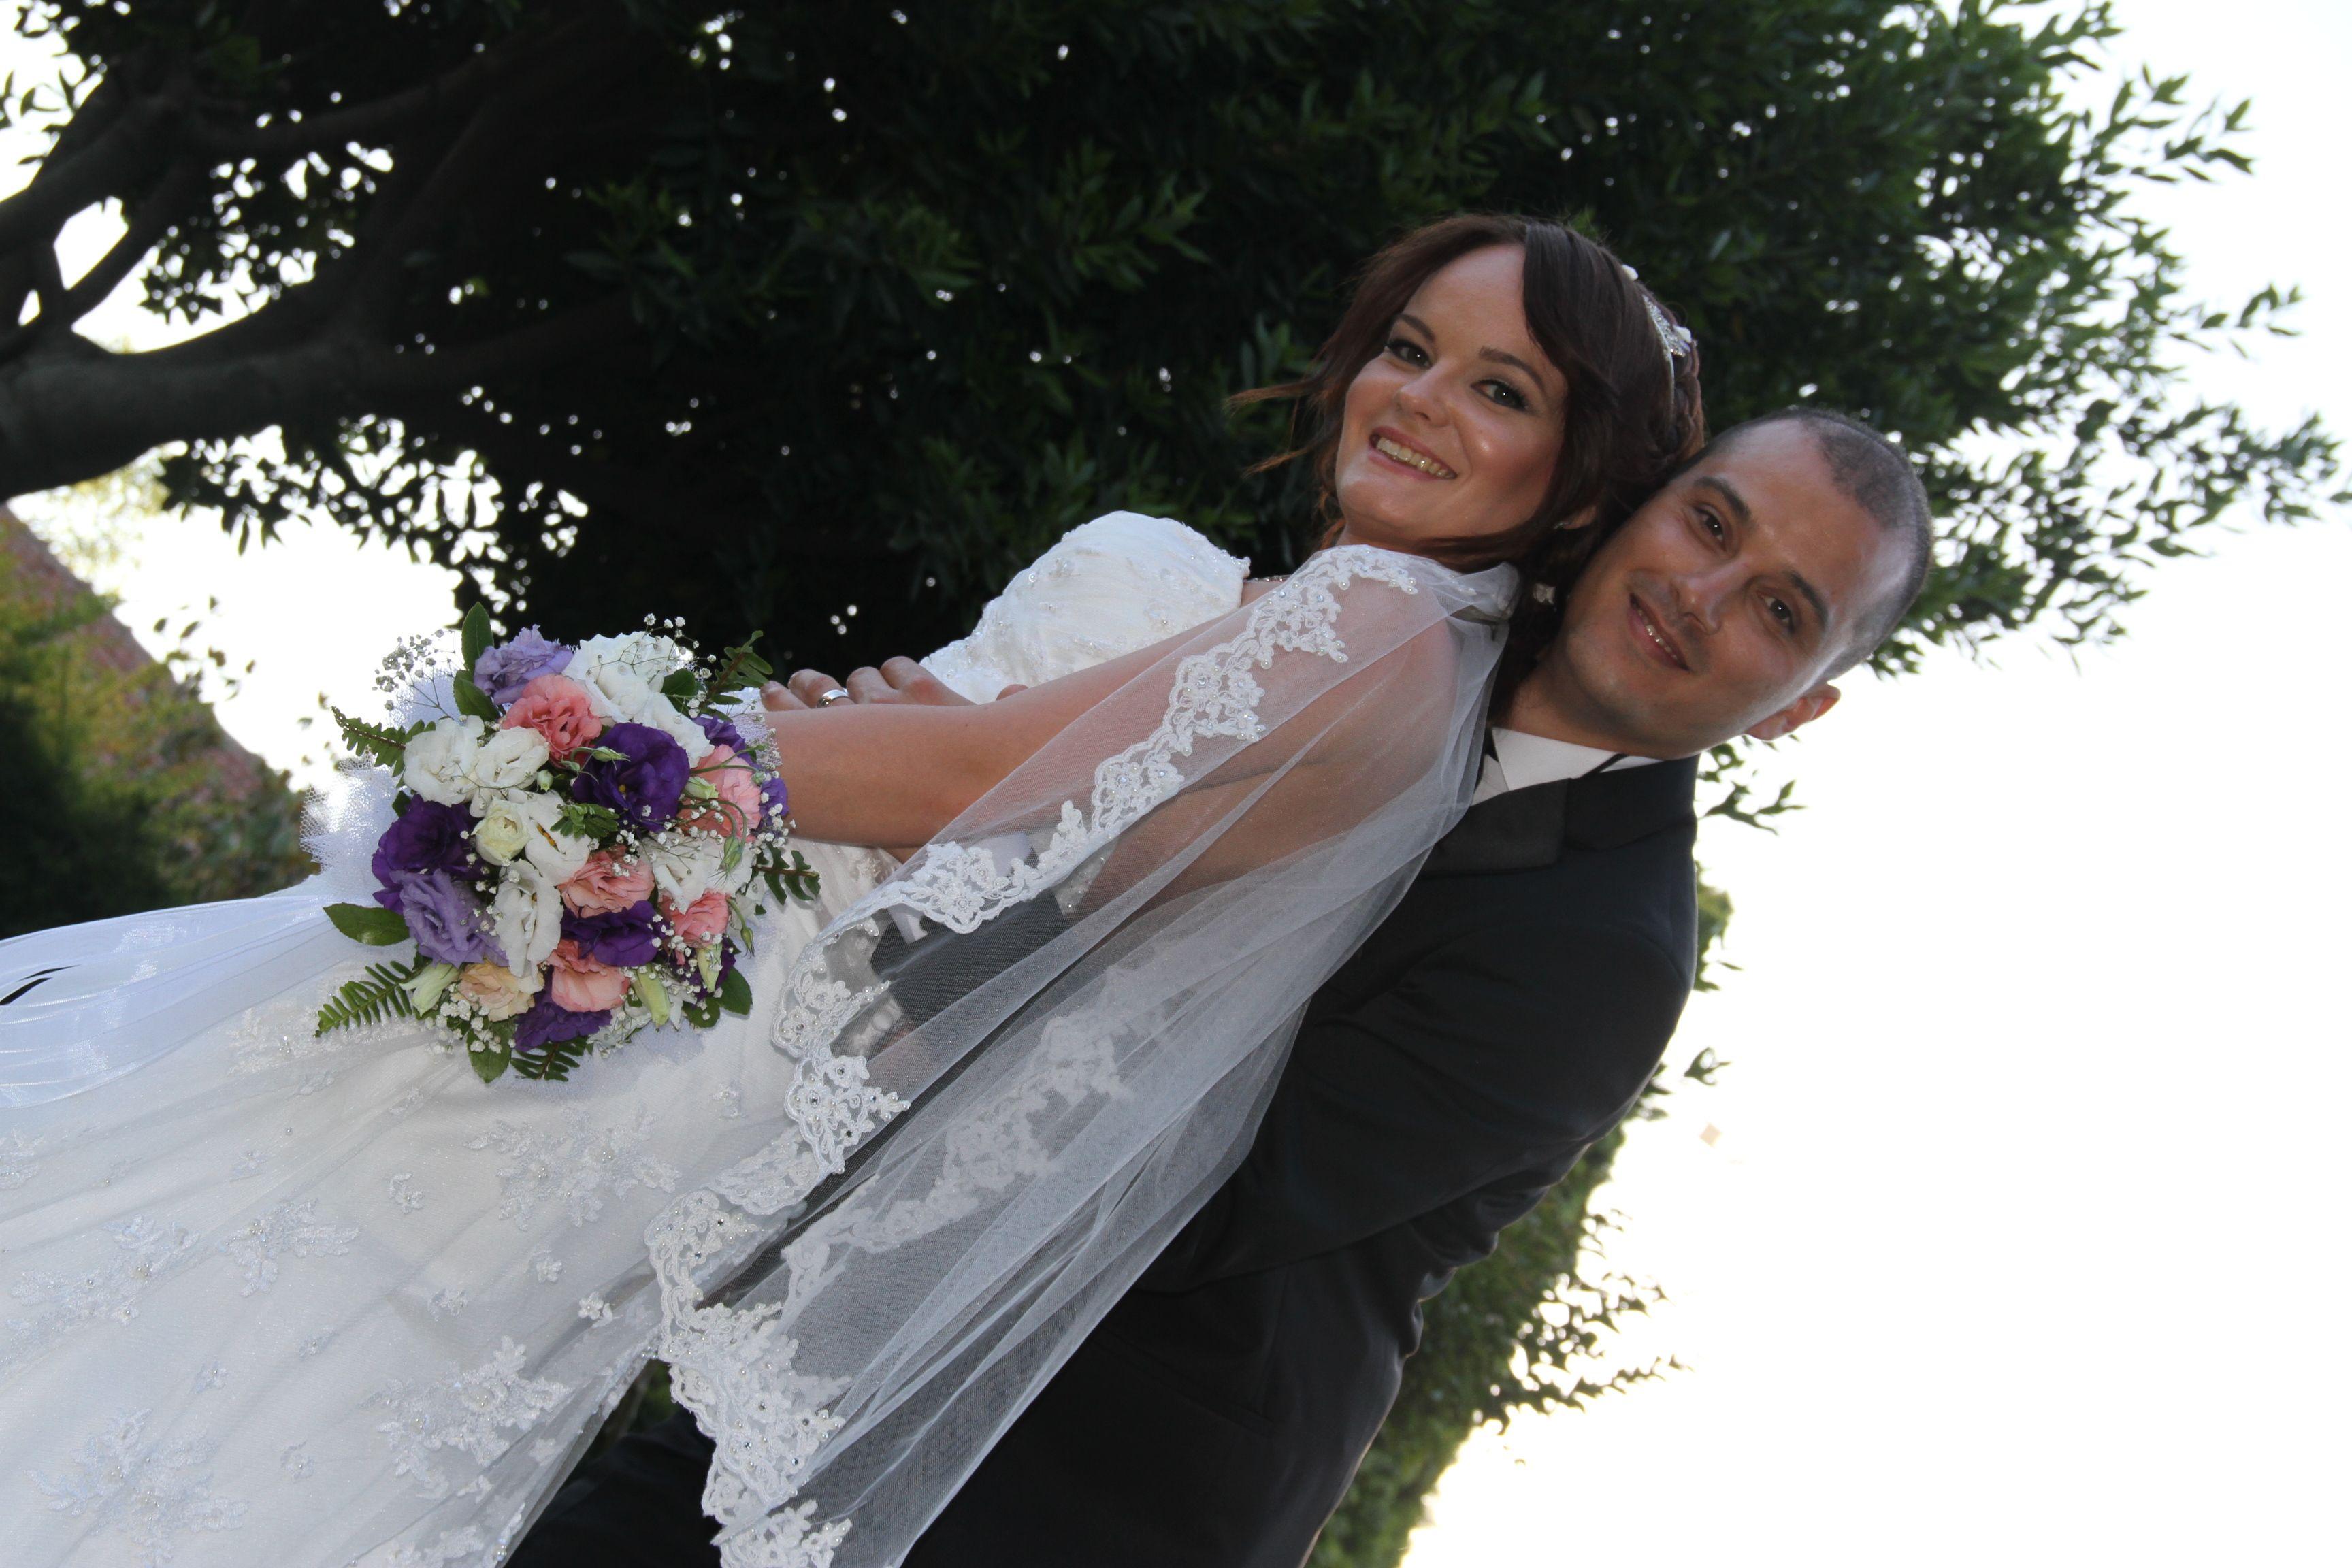 #leparcdemariage #love #wedding #istabul #bride #groom #duvak #veil #bridal #weddinggowns #ask #evlilik #dugunmekani #kirdugunu #dugun #avrupayakasi #cagteks #cagteksgelinlik #turkiye #izdivacpark #zeytinburnu